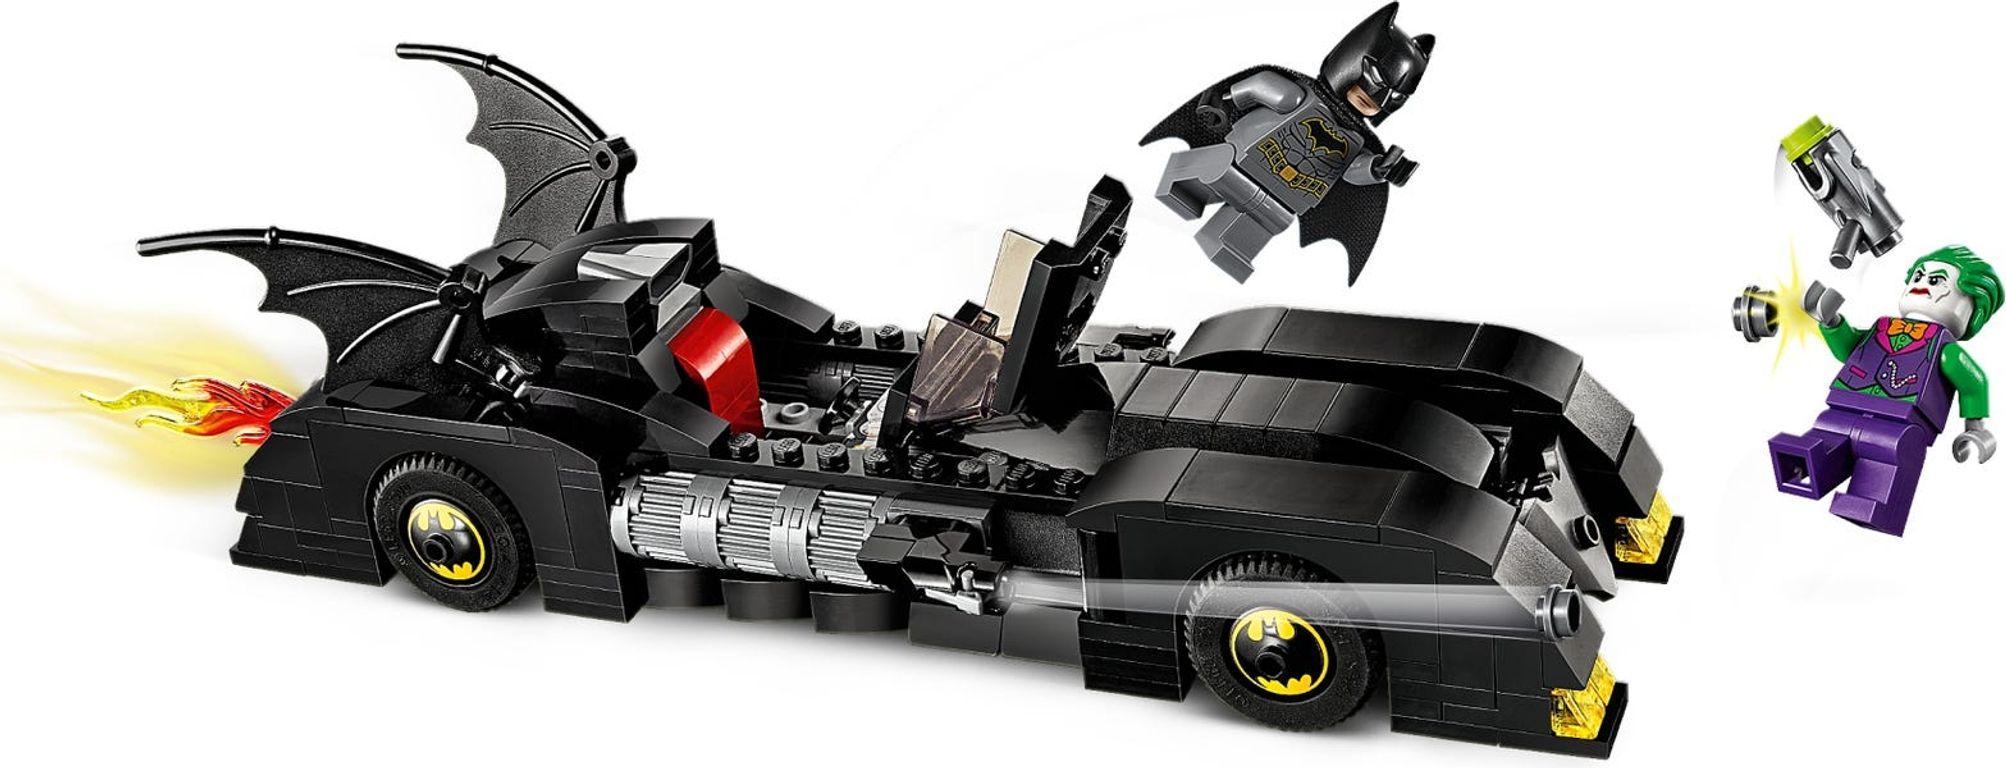 Batmobile™: Pursuit of The Joker™ gameplay